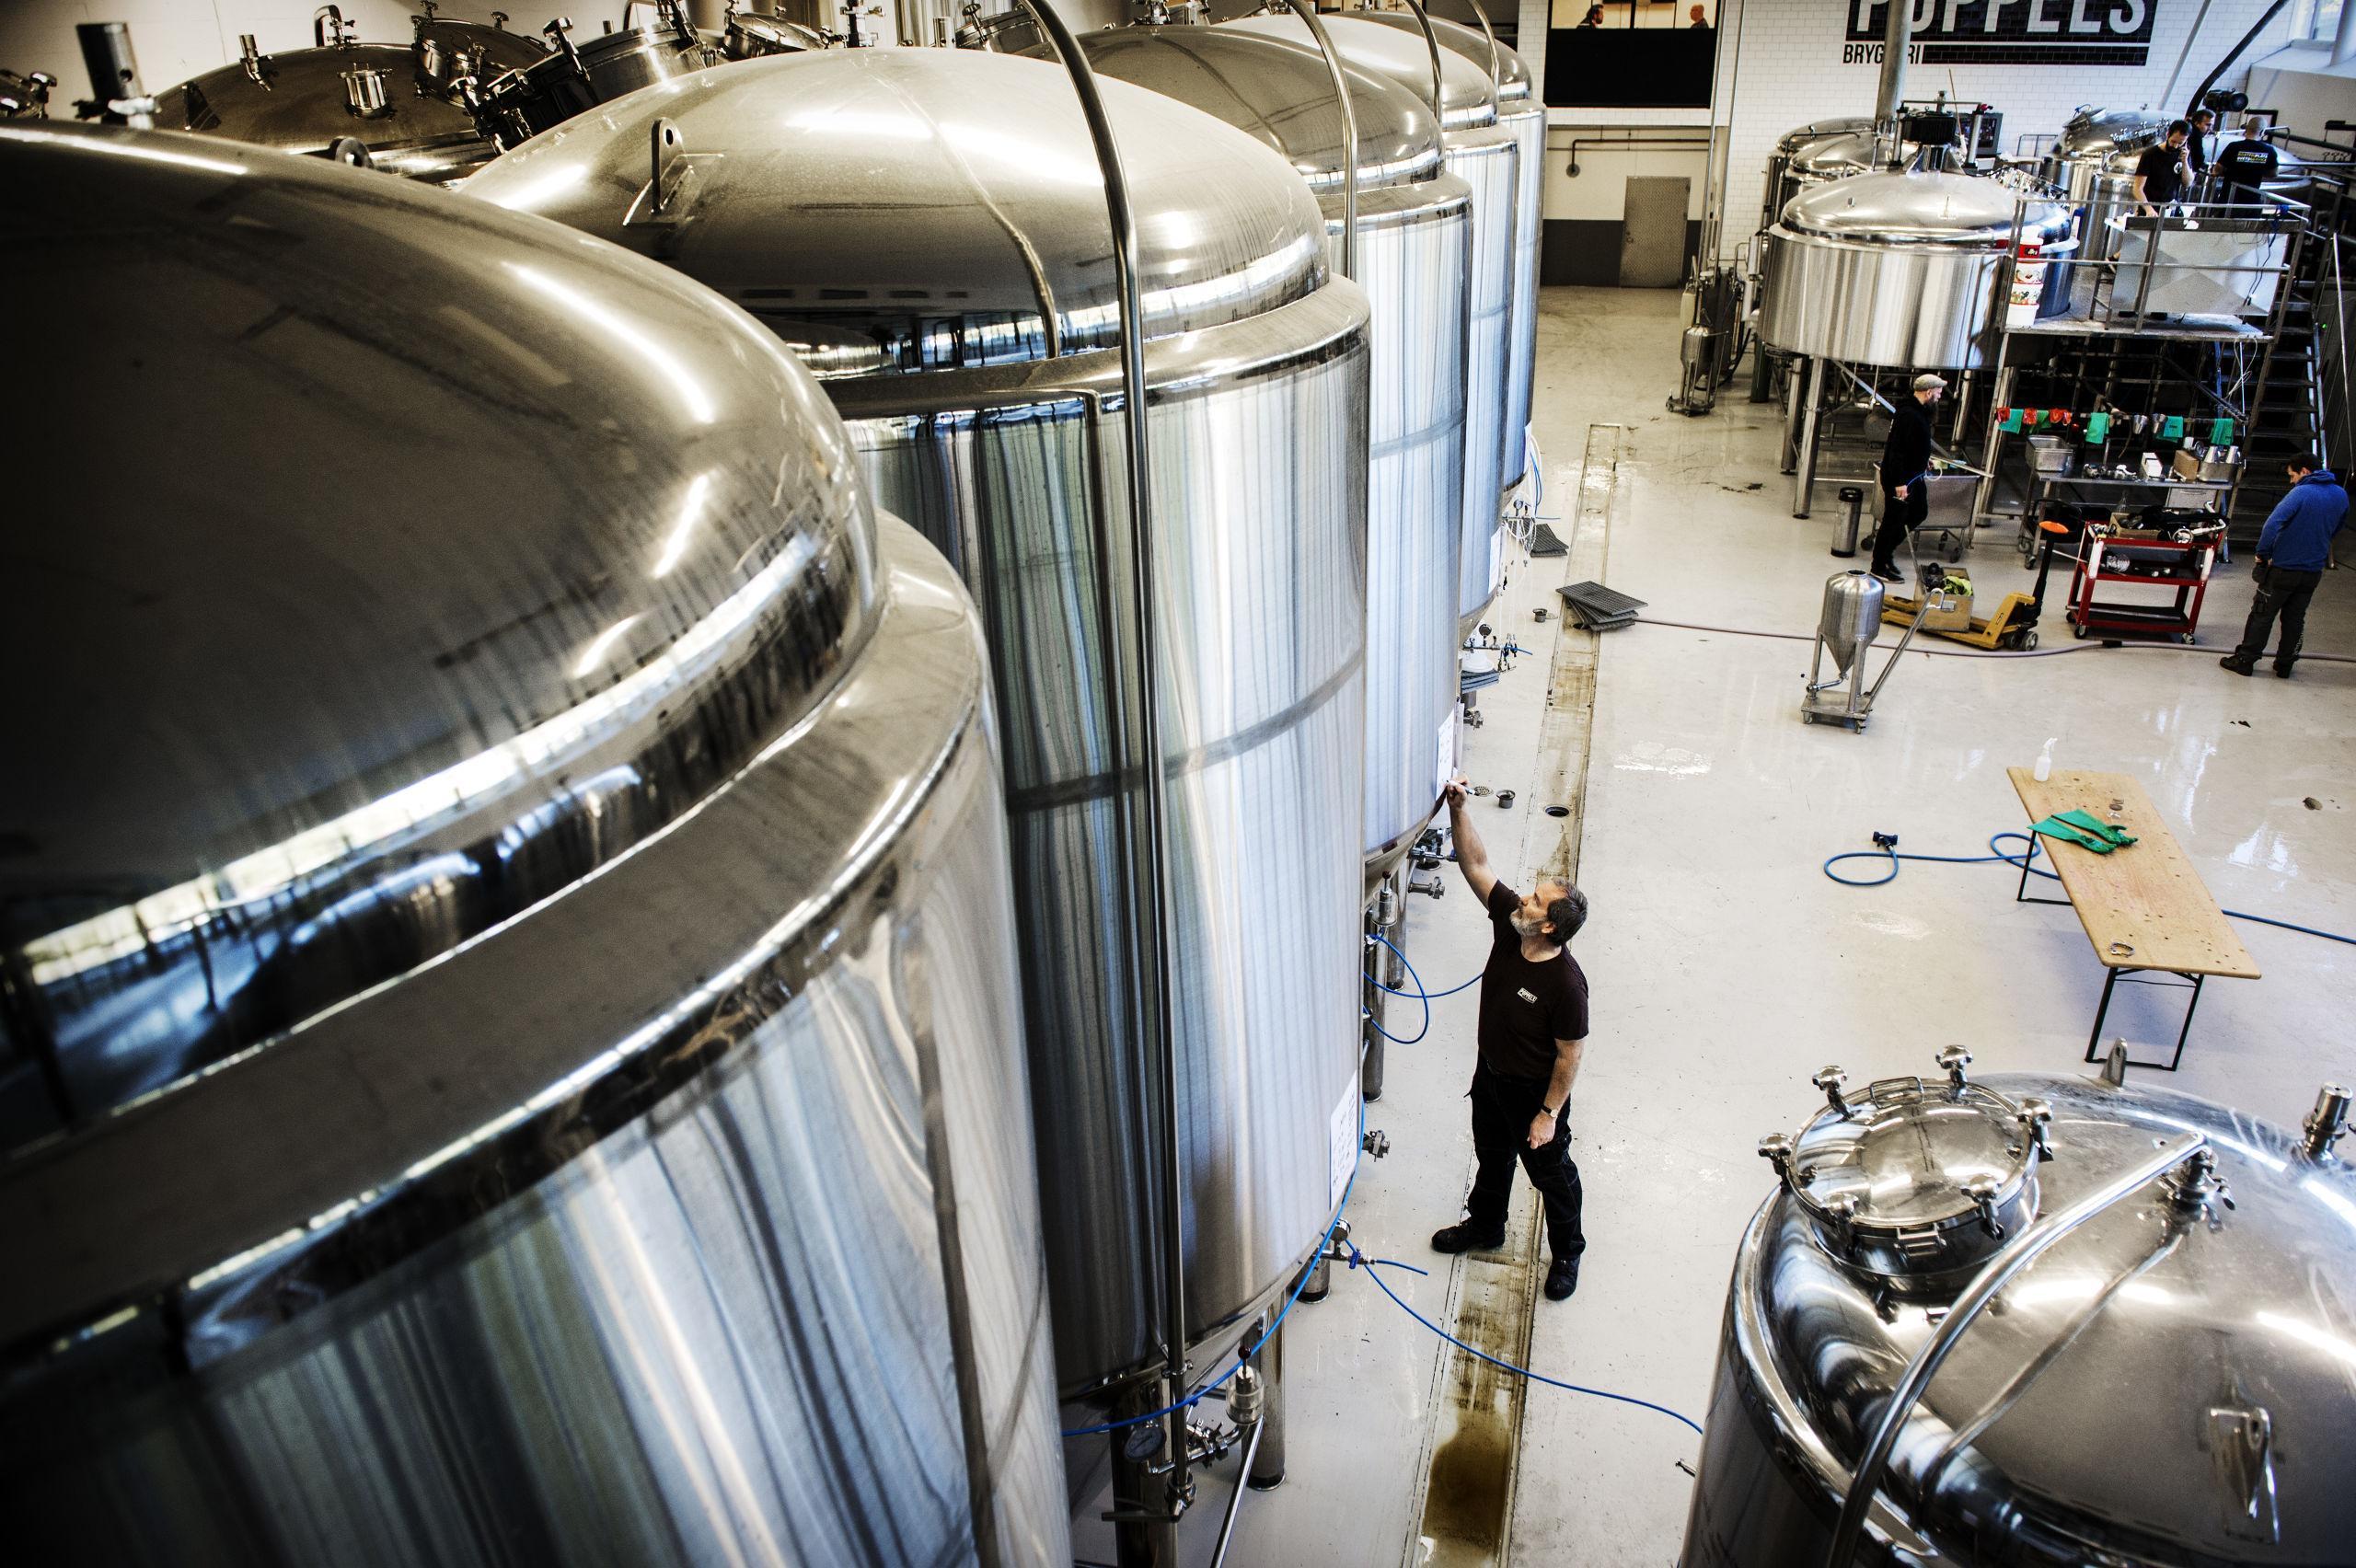 De öppnar bryggeri mitt i centrala Göteborg